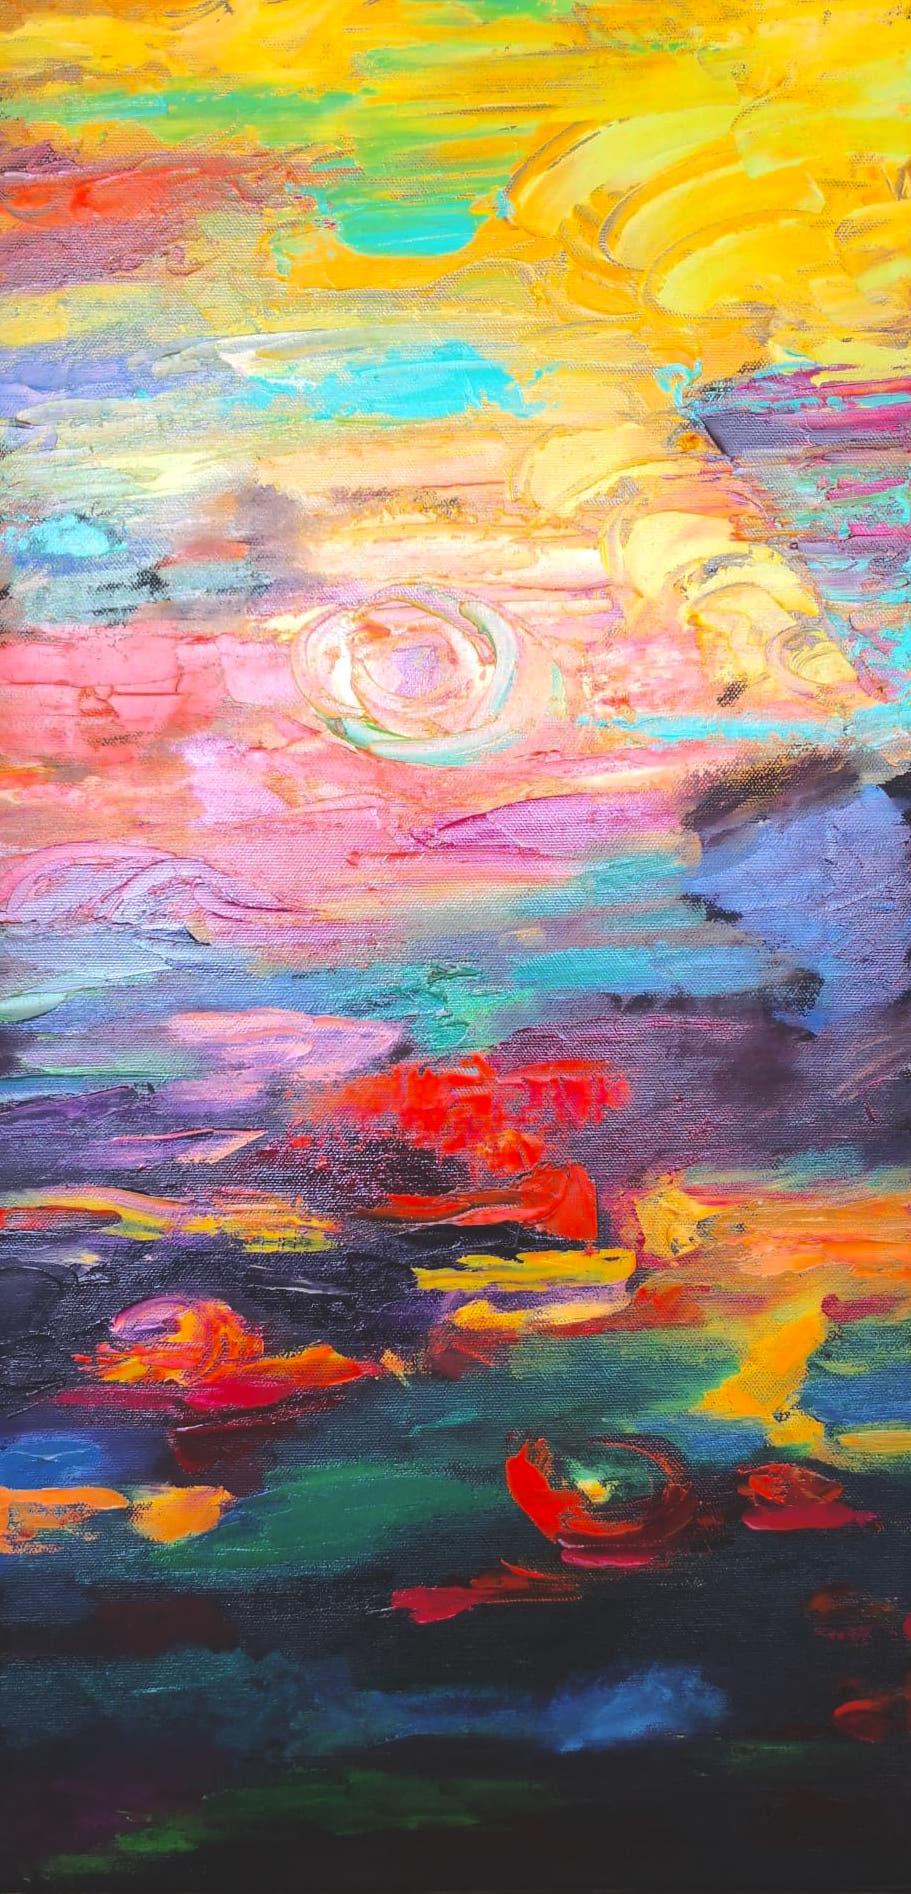 Heather M. Johnson, Aubade Part III (Triptych), Oil on canvas, 24 x 12 inches, $150:panel .jpg